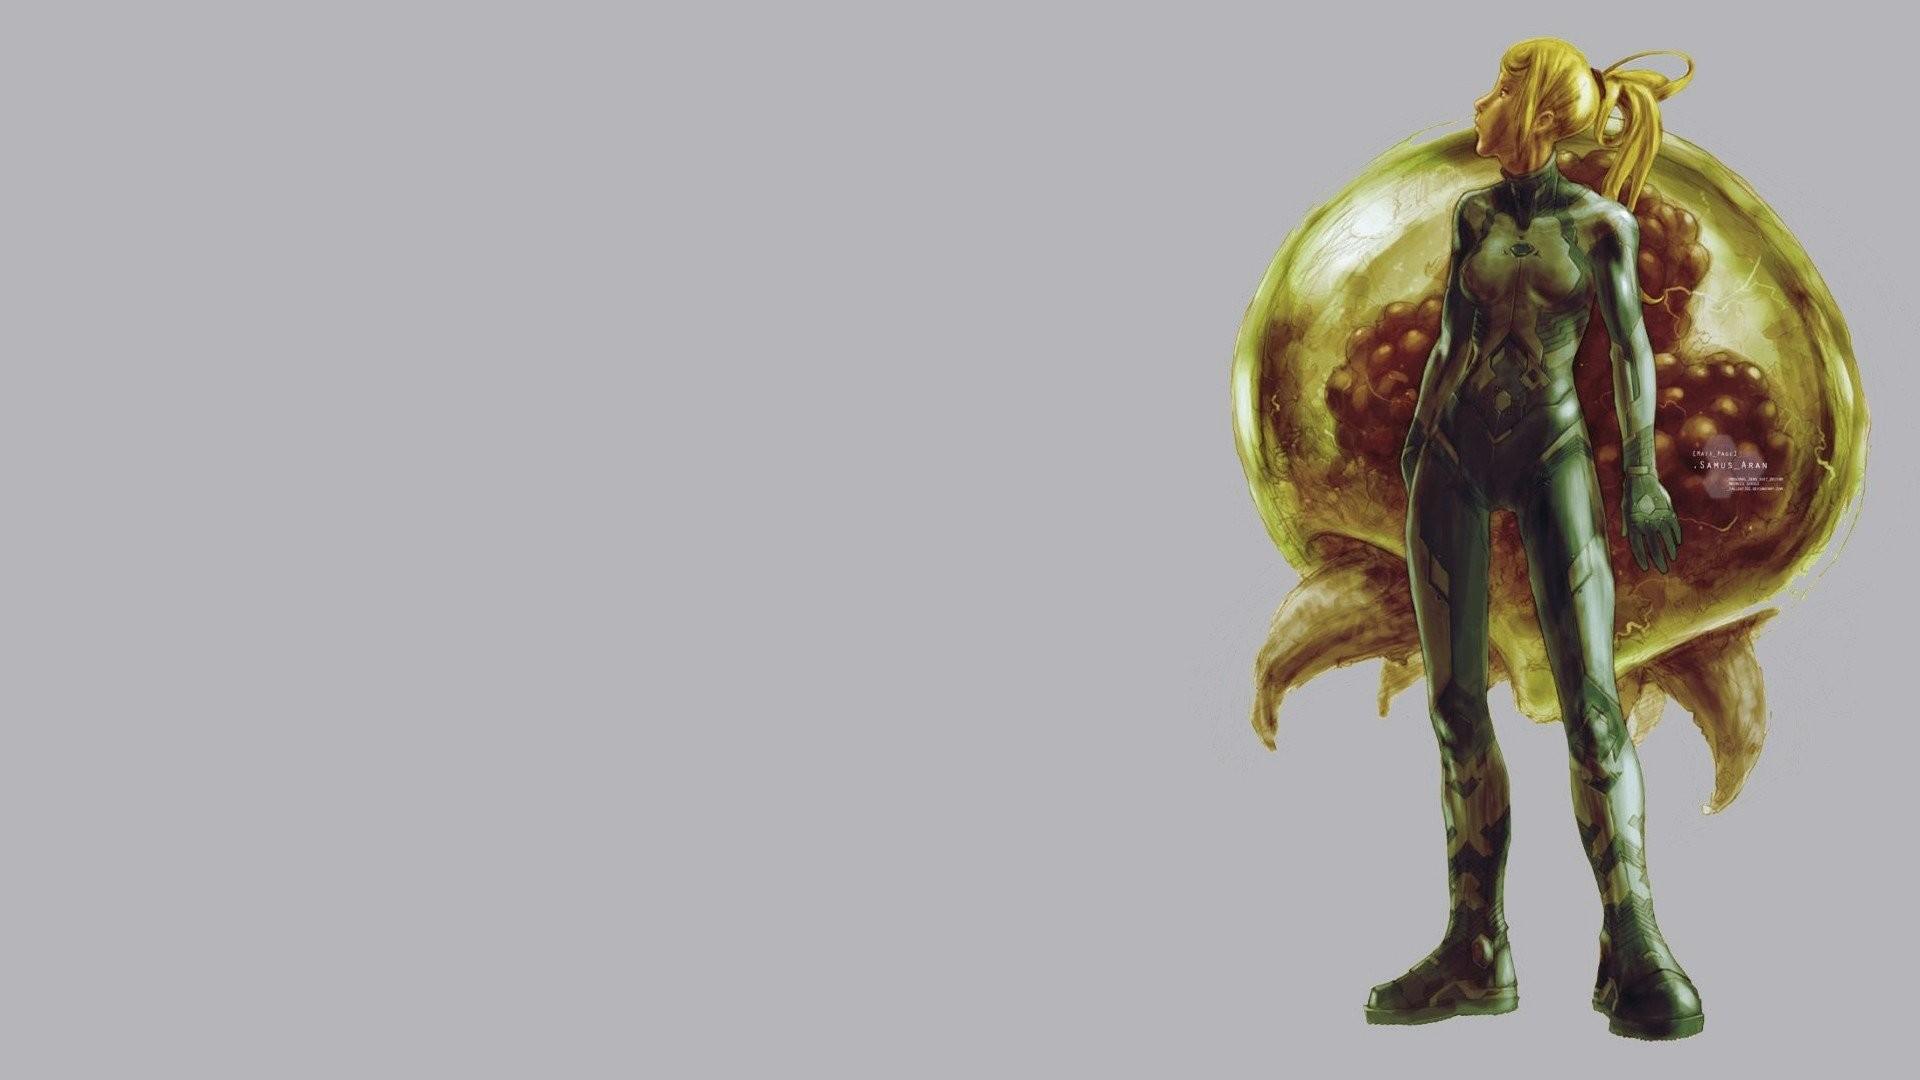 Video Games Metroid Samus Aran Gray Background Women Blondes Long Hair  Ponytails Bodysuits Aliens Nintendo Zero Suit …